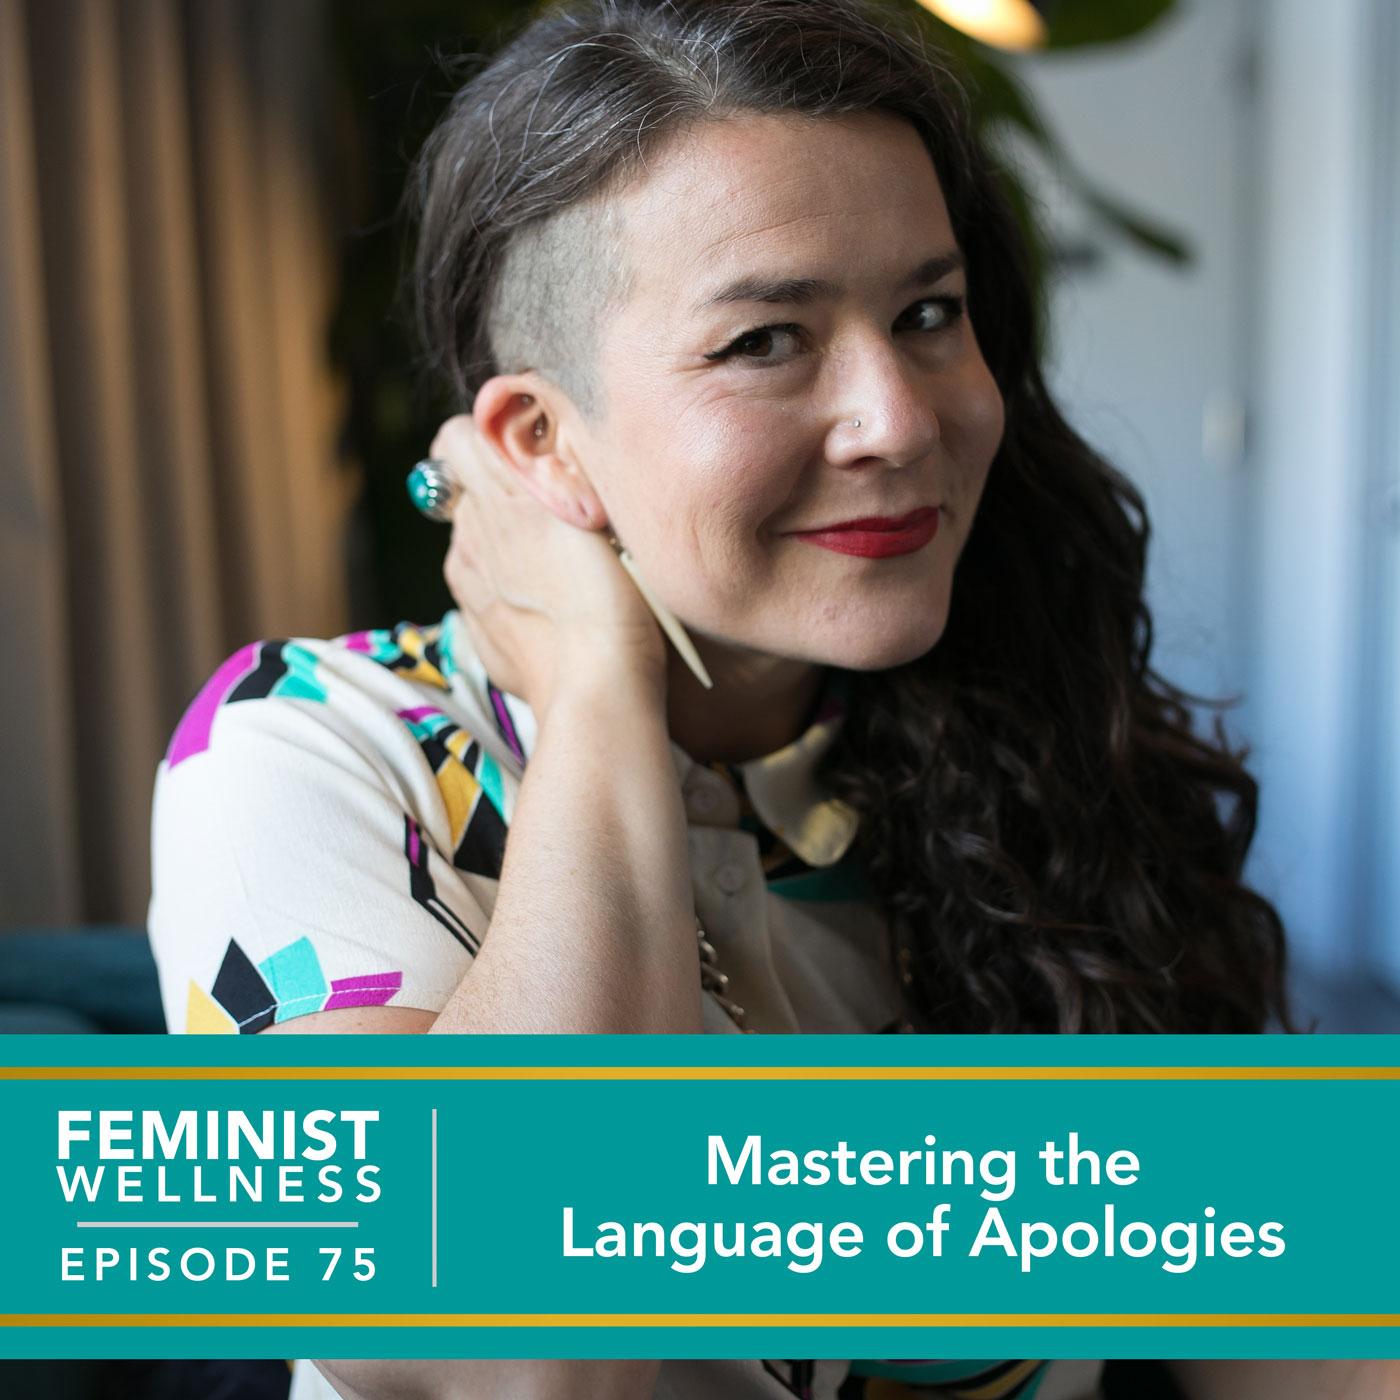 Mastering the Language of Apologies